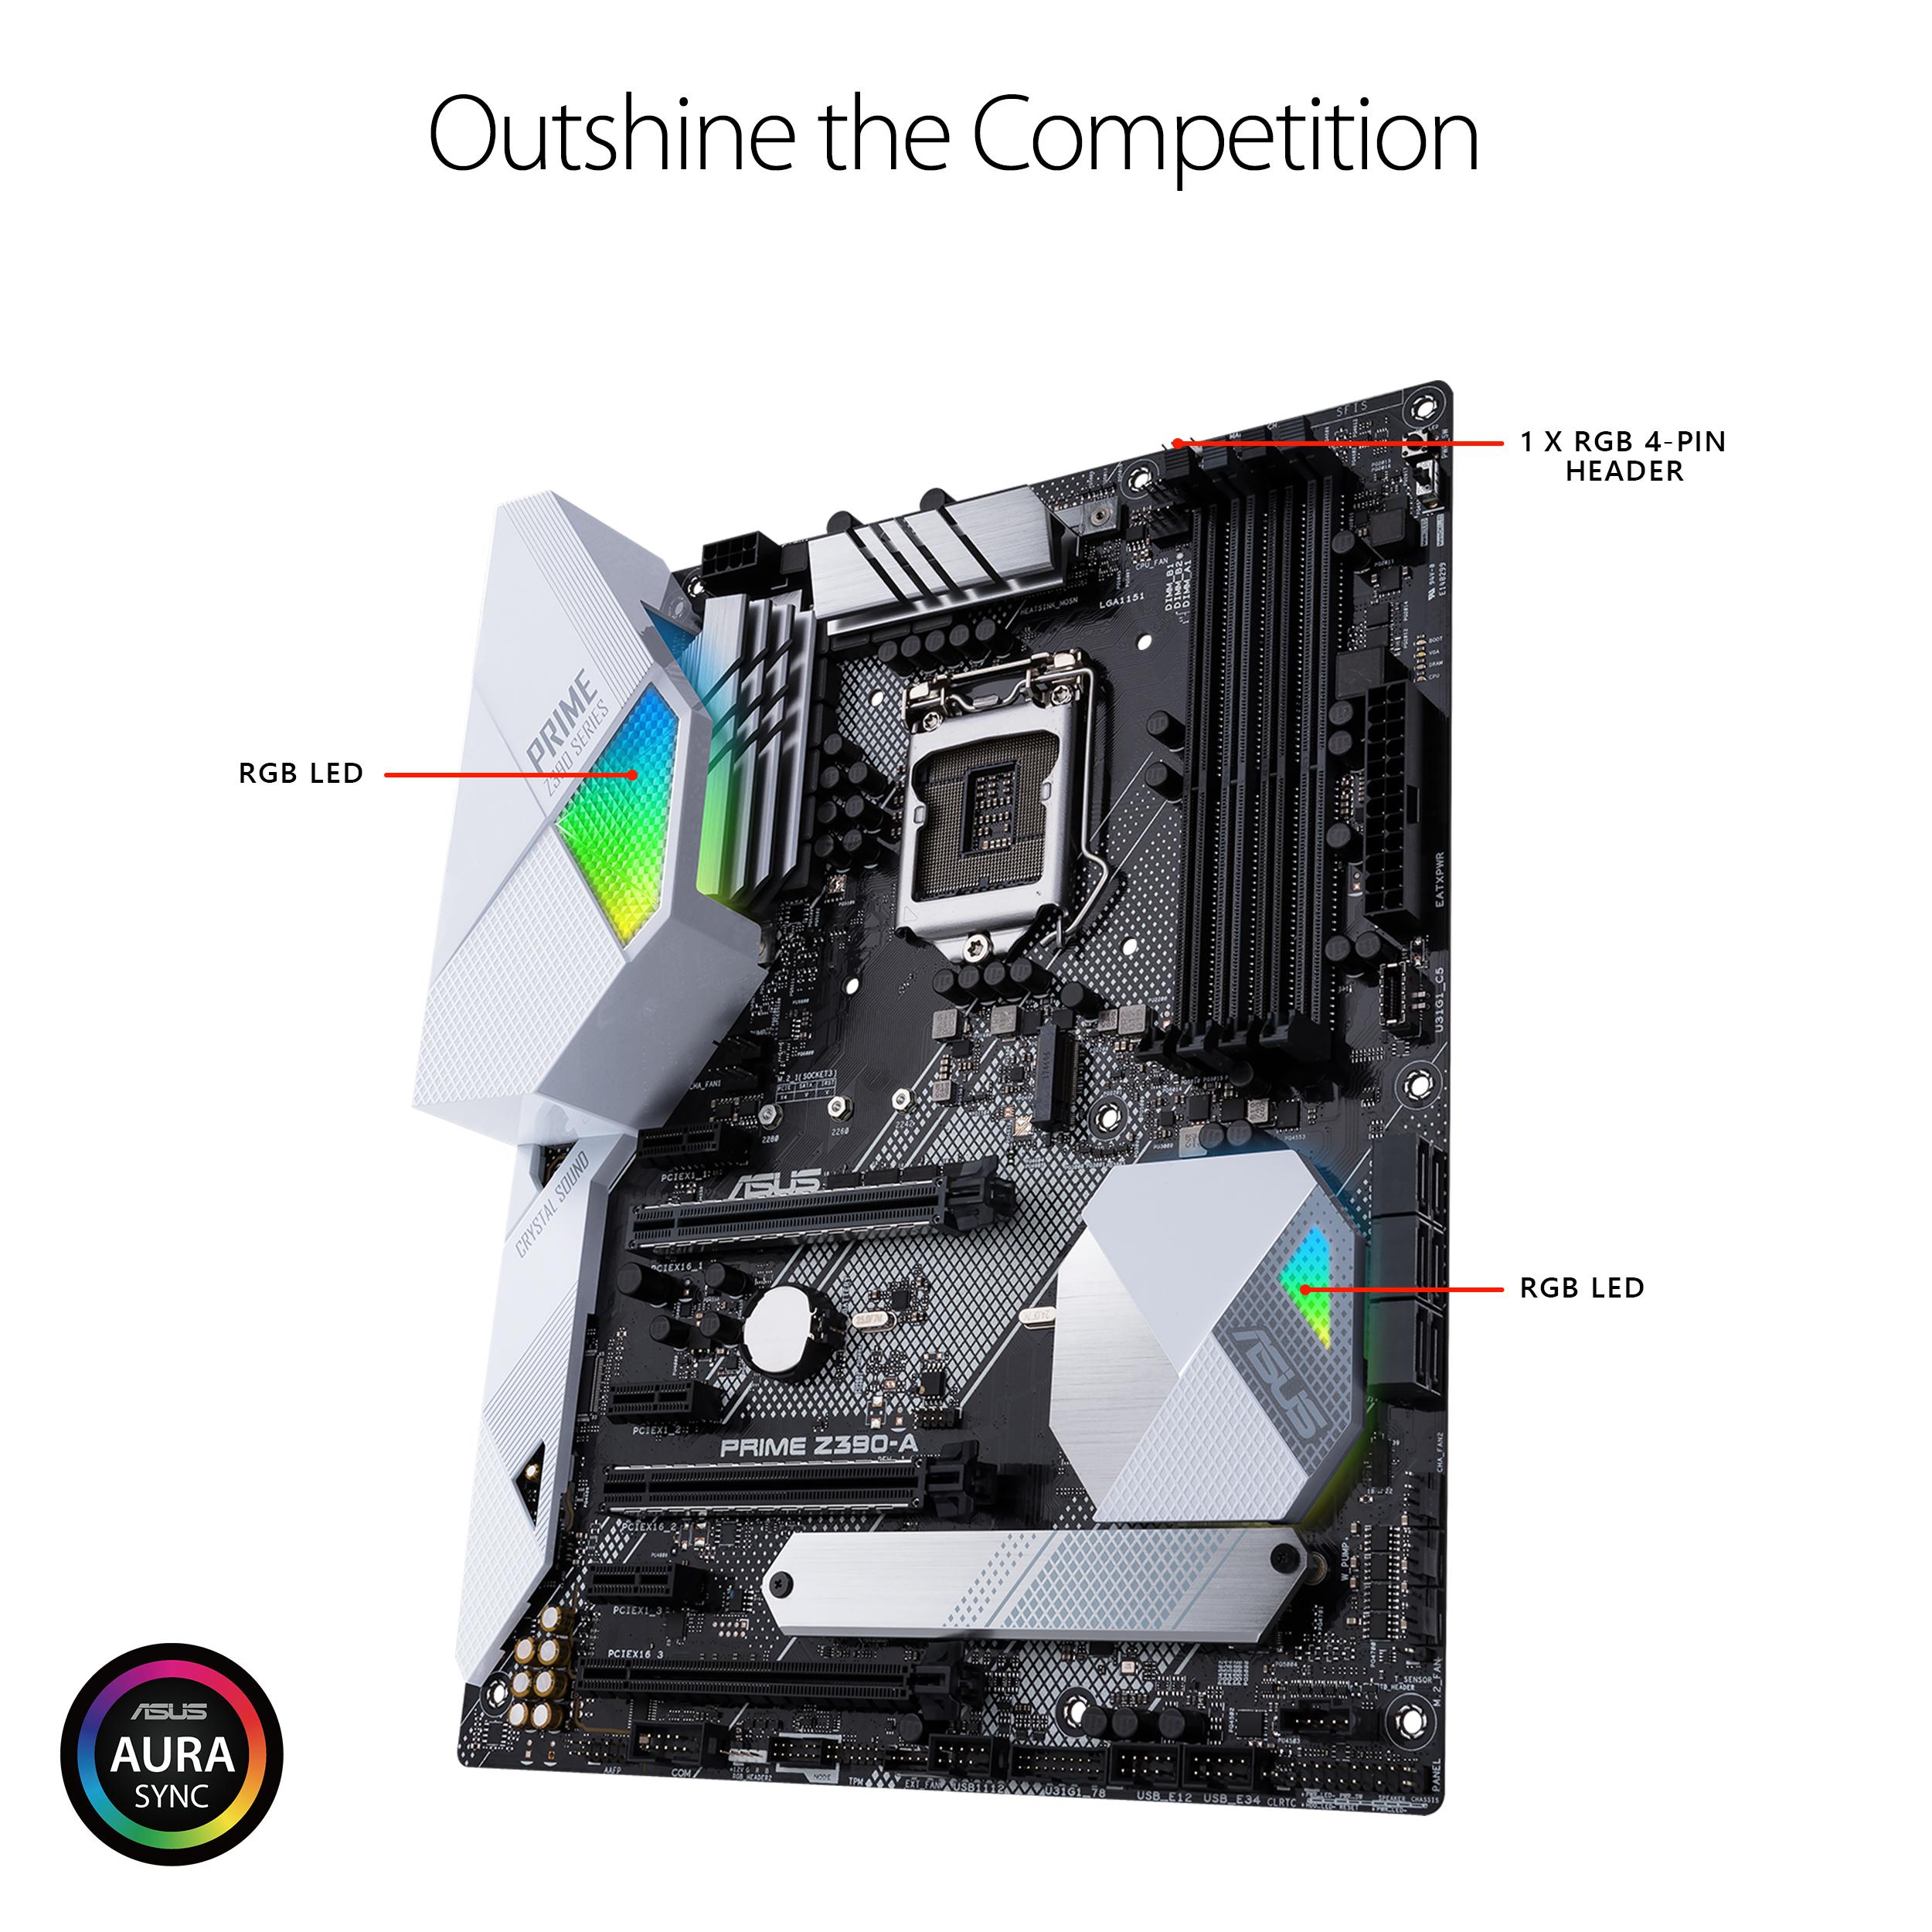 Asus - Motherboard Asus PRIME Z390-A